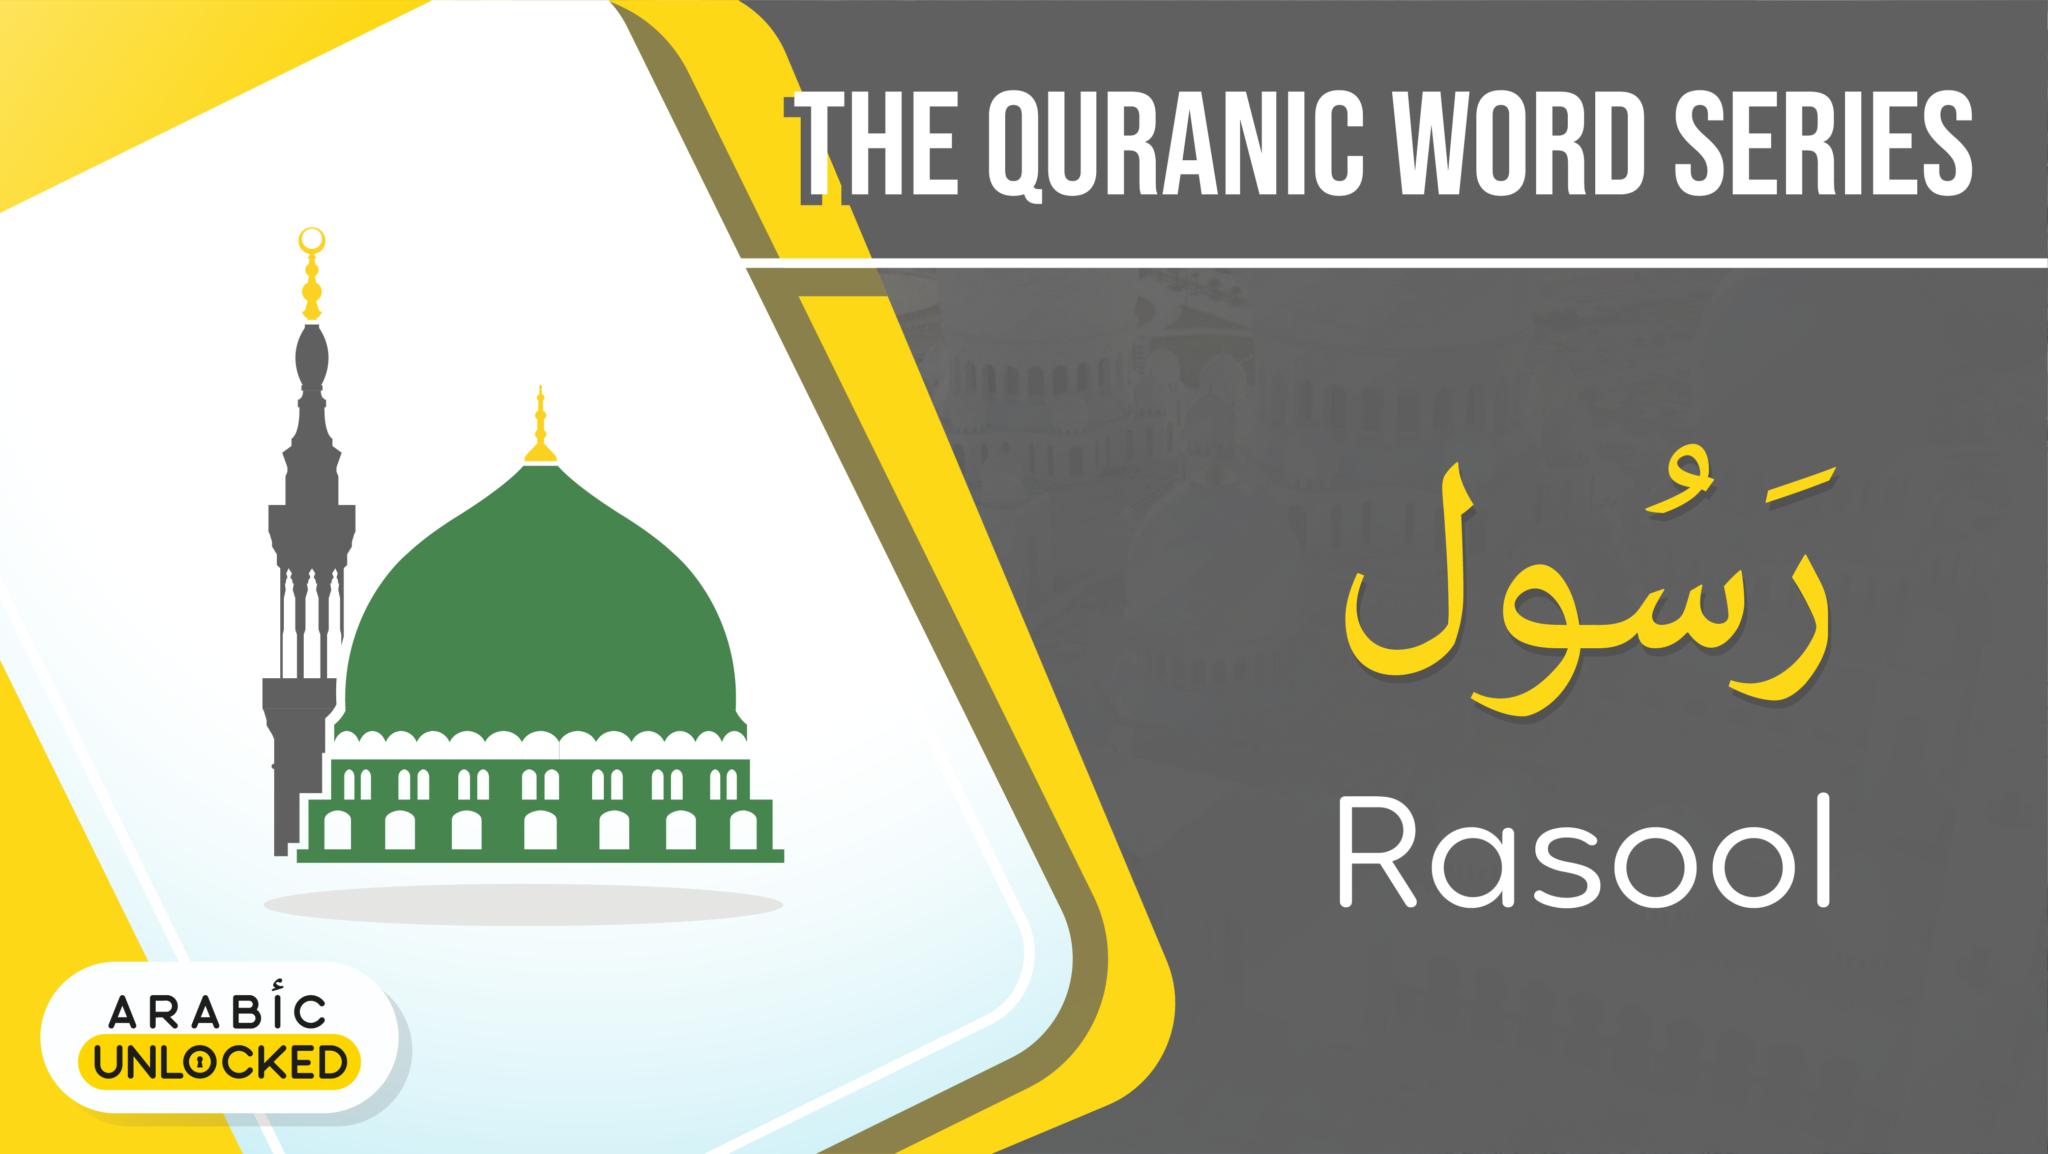 Quranic Word Series: Rasool